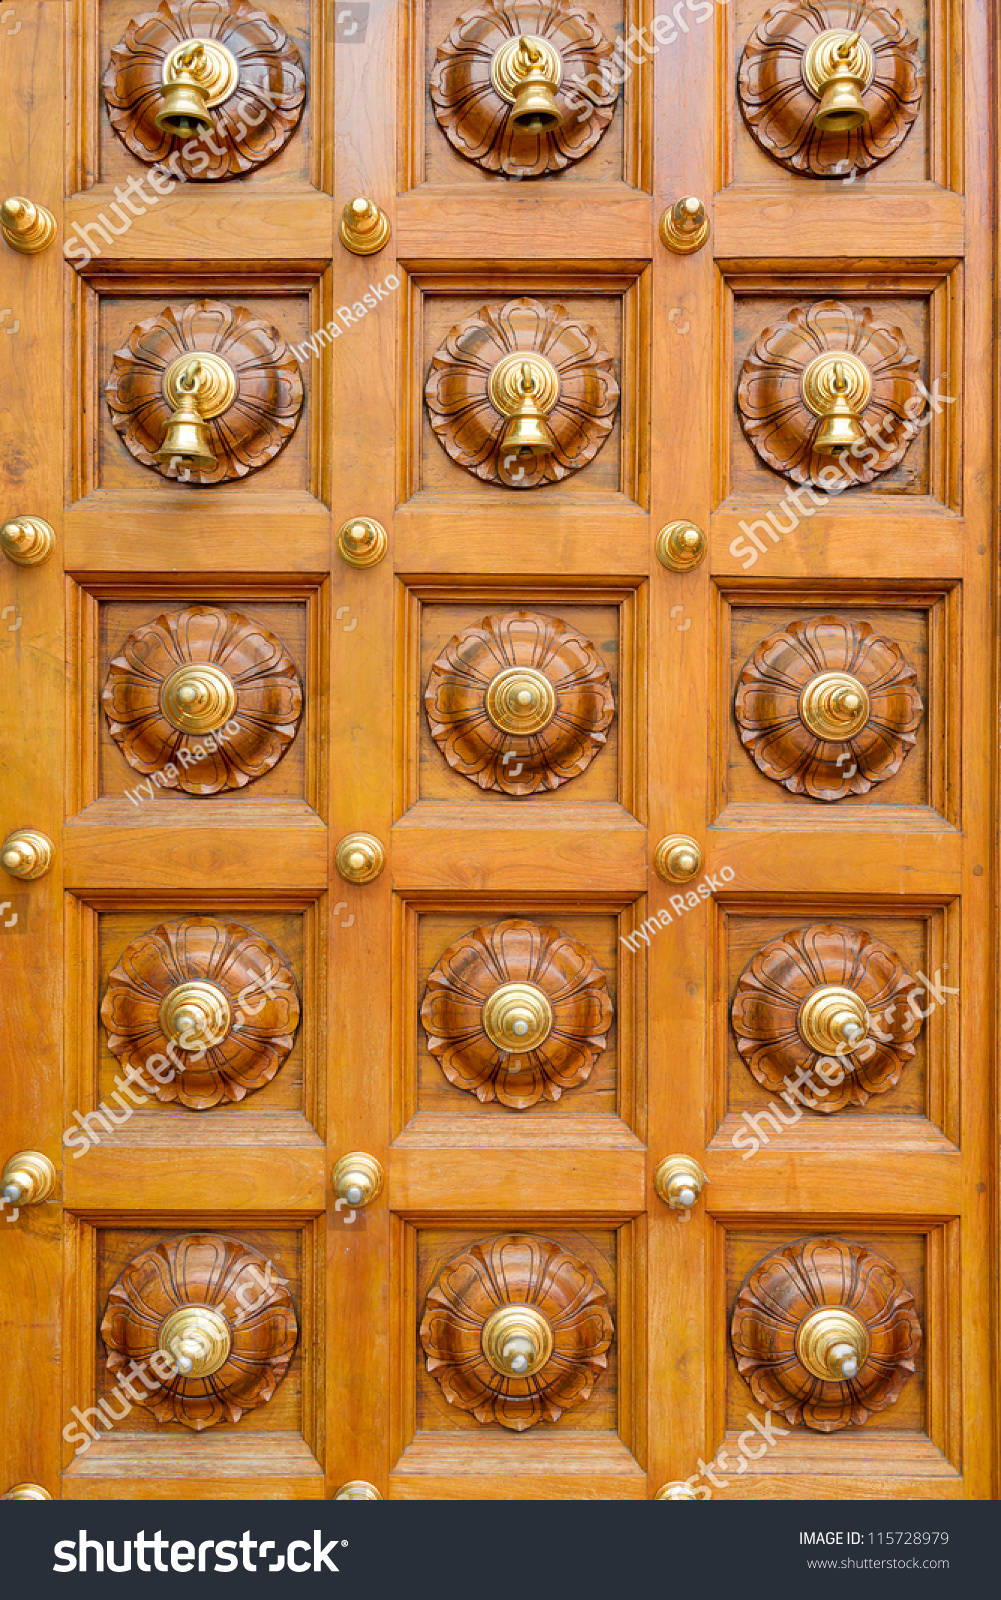 Temple Glass Shree Rangkala Design Surat Gujarat Teak Doors Hindu Designs For Home